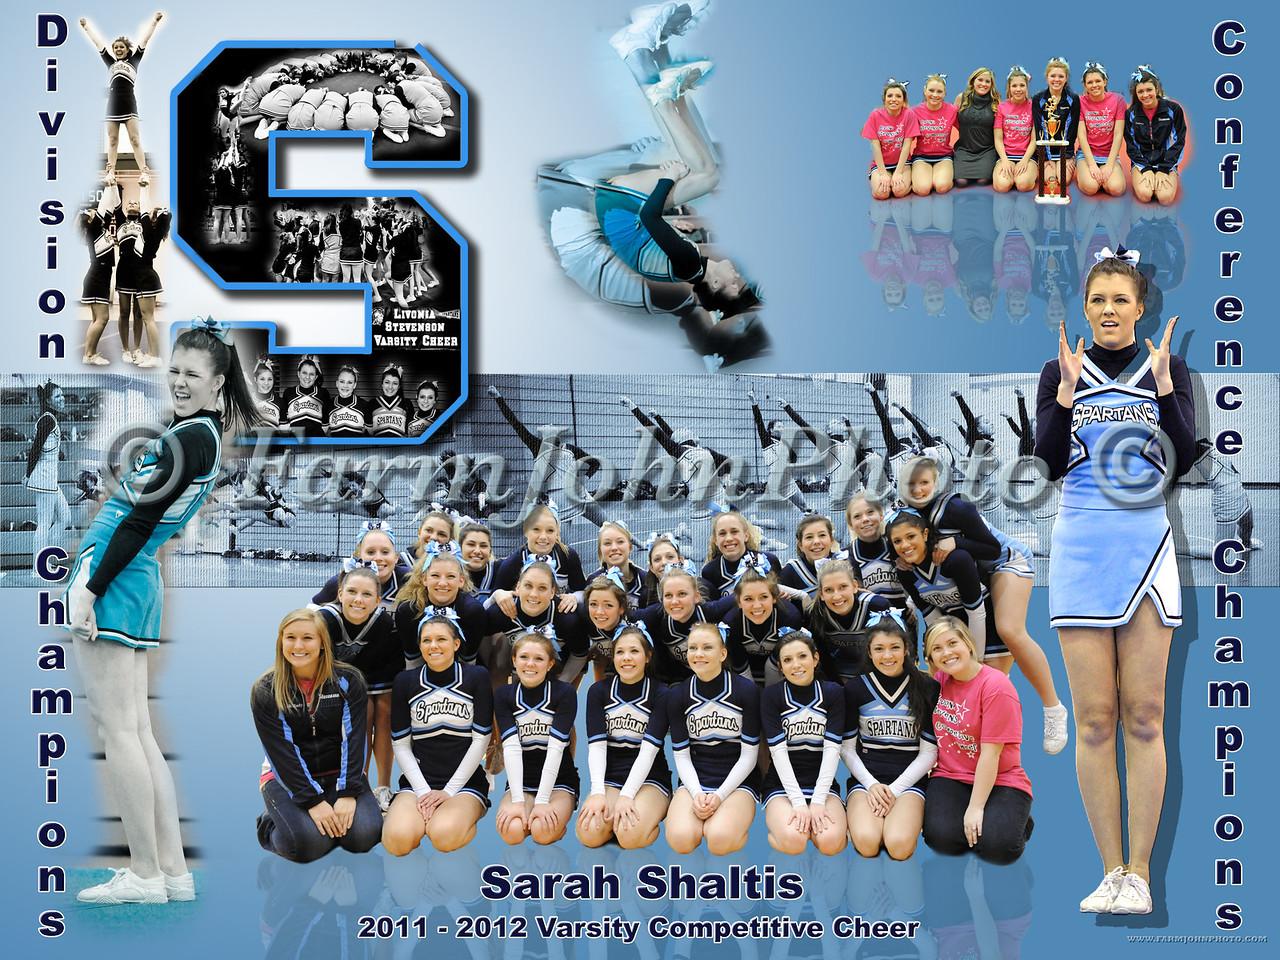 Sarah Shaltis 24 x 18 Format Proof 3